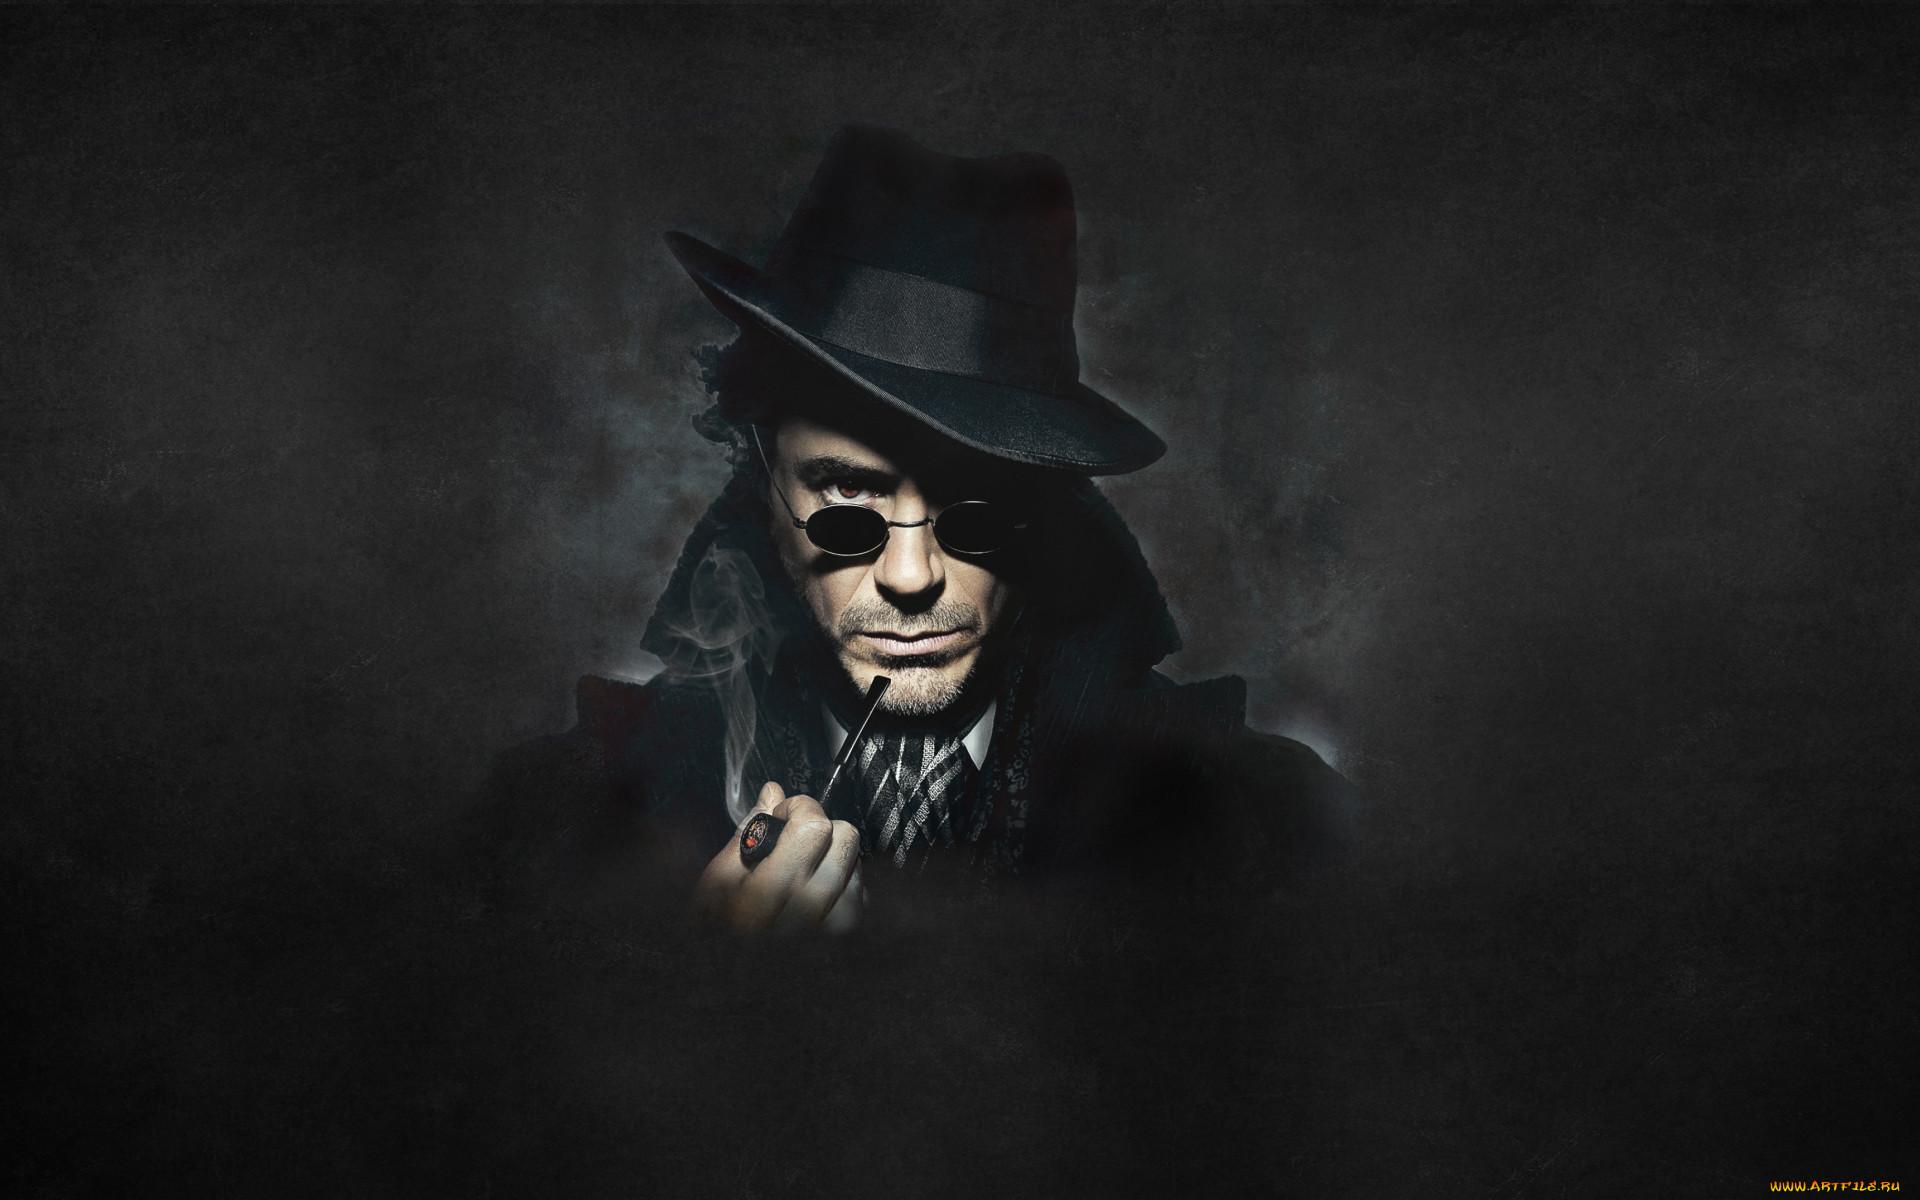 все фильмы шерлок холмс с робертом дауни младшим